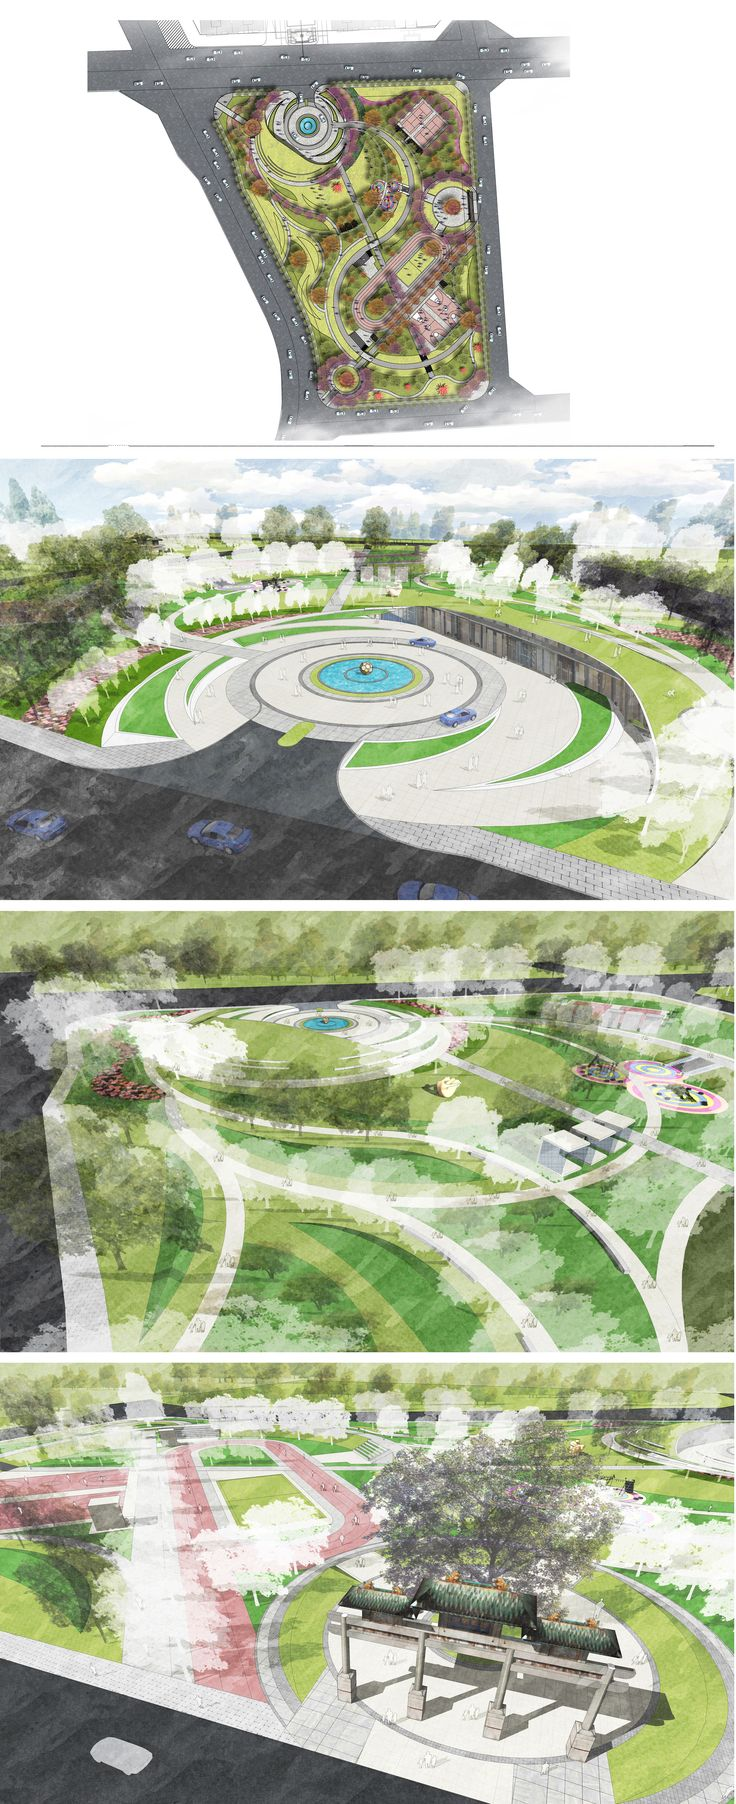 BJ sports park design